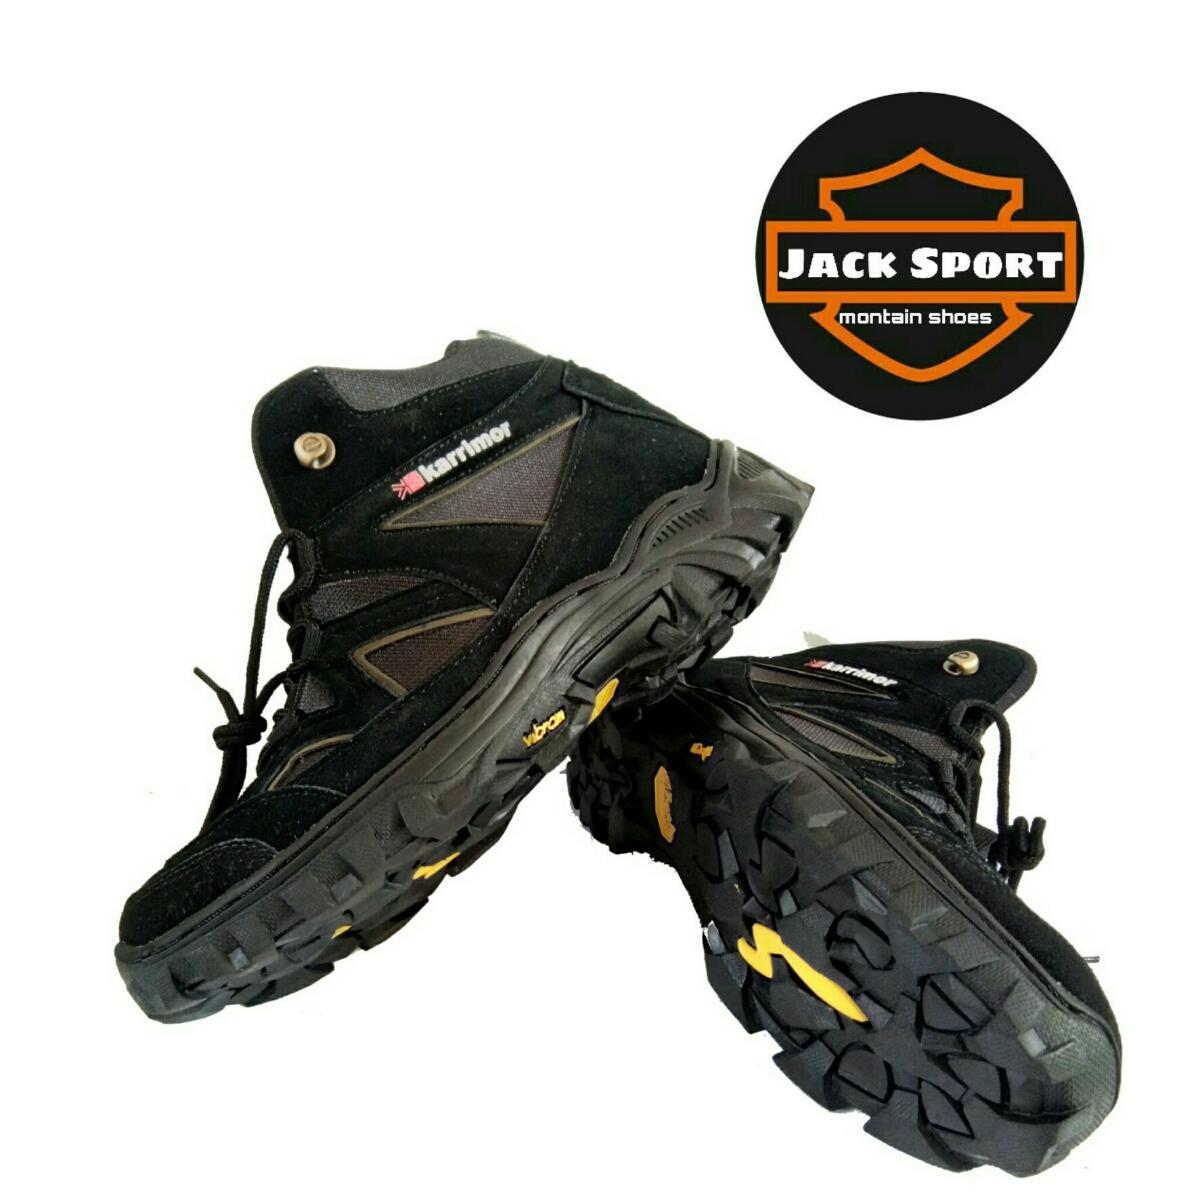 Sepatu Gunung Pria - Sepatu Karrimor Low Tracking - Sepatu Outdoor - Sepatu  Hiking Boots Waterproof 83d4957524